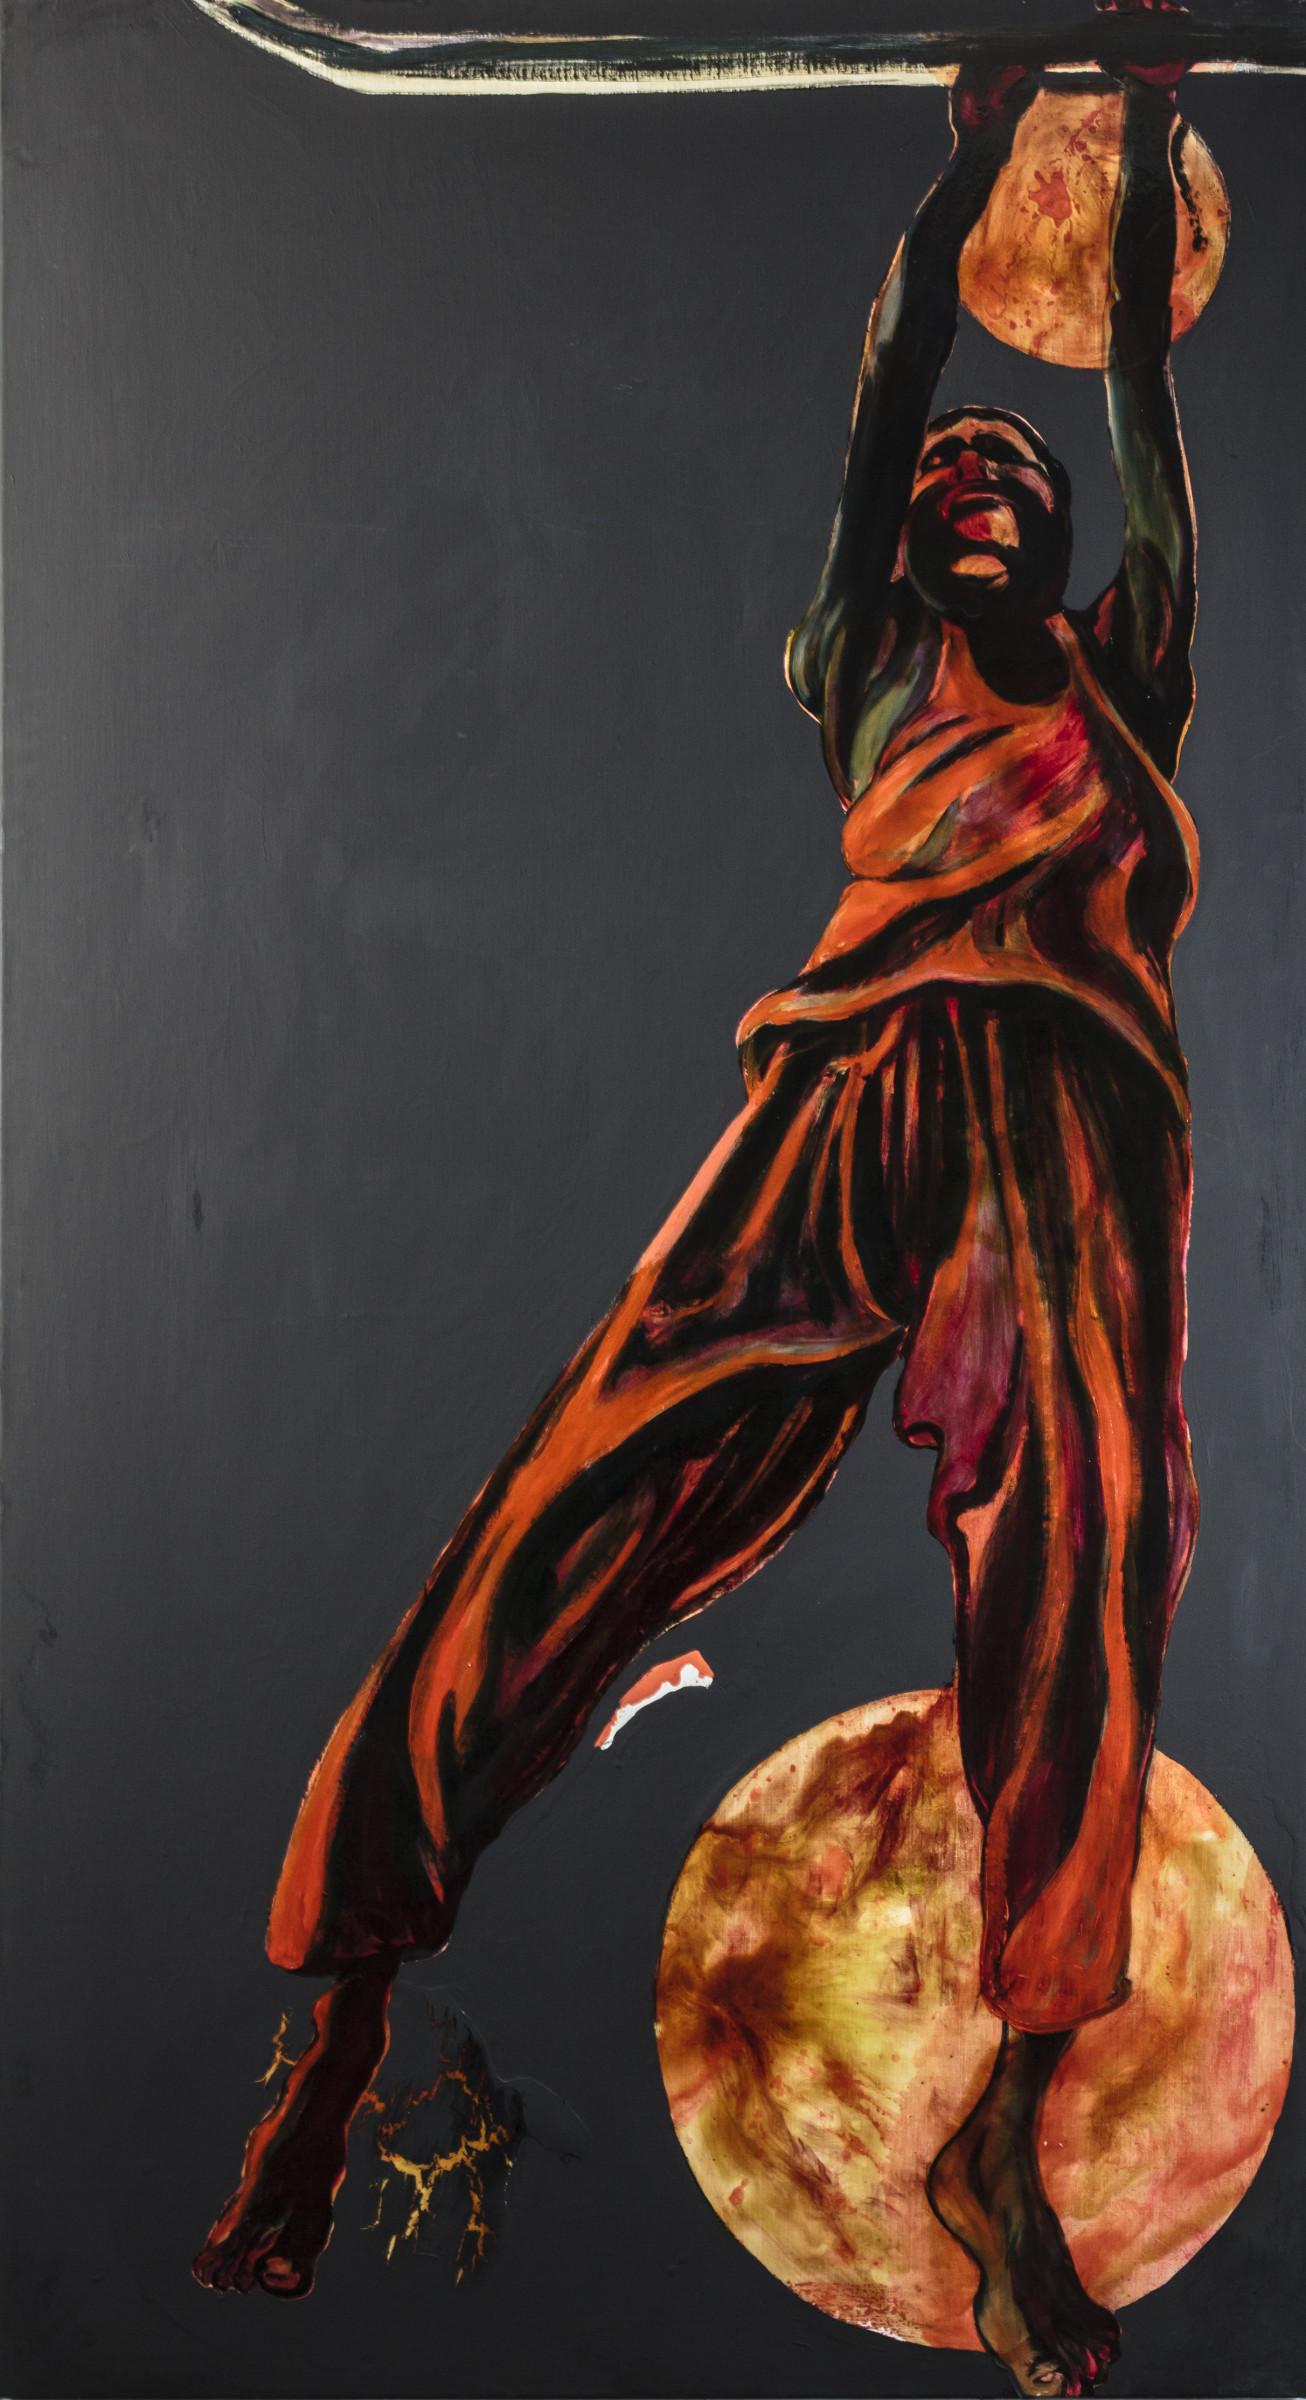 <span class=&#34;link fancybox-details-link&#34;><a href=&#34;/exhibitions/14/works/artworks4987/&#34;>View Detail Page</a></span><div class=&#34;medium&#34;>Acryl on canvas</div> <div class=&#34;dimensions&#34;>200 x 110 cm</div>